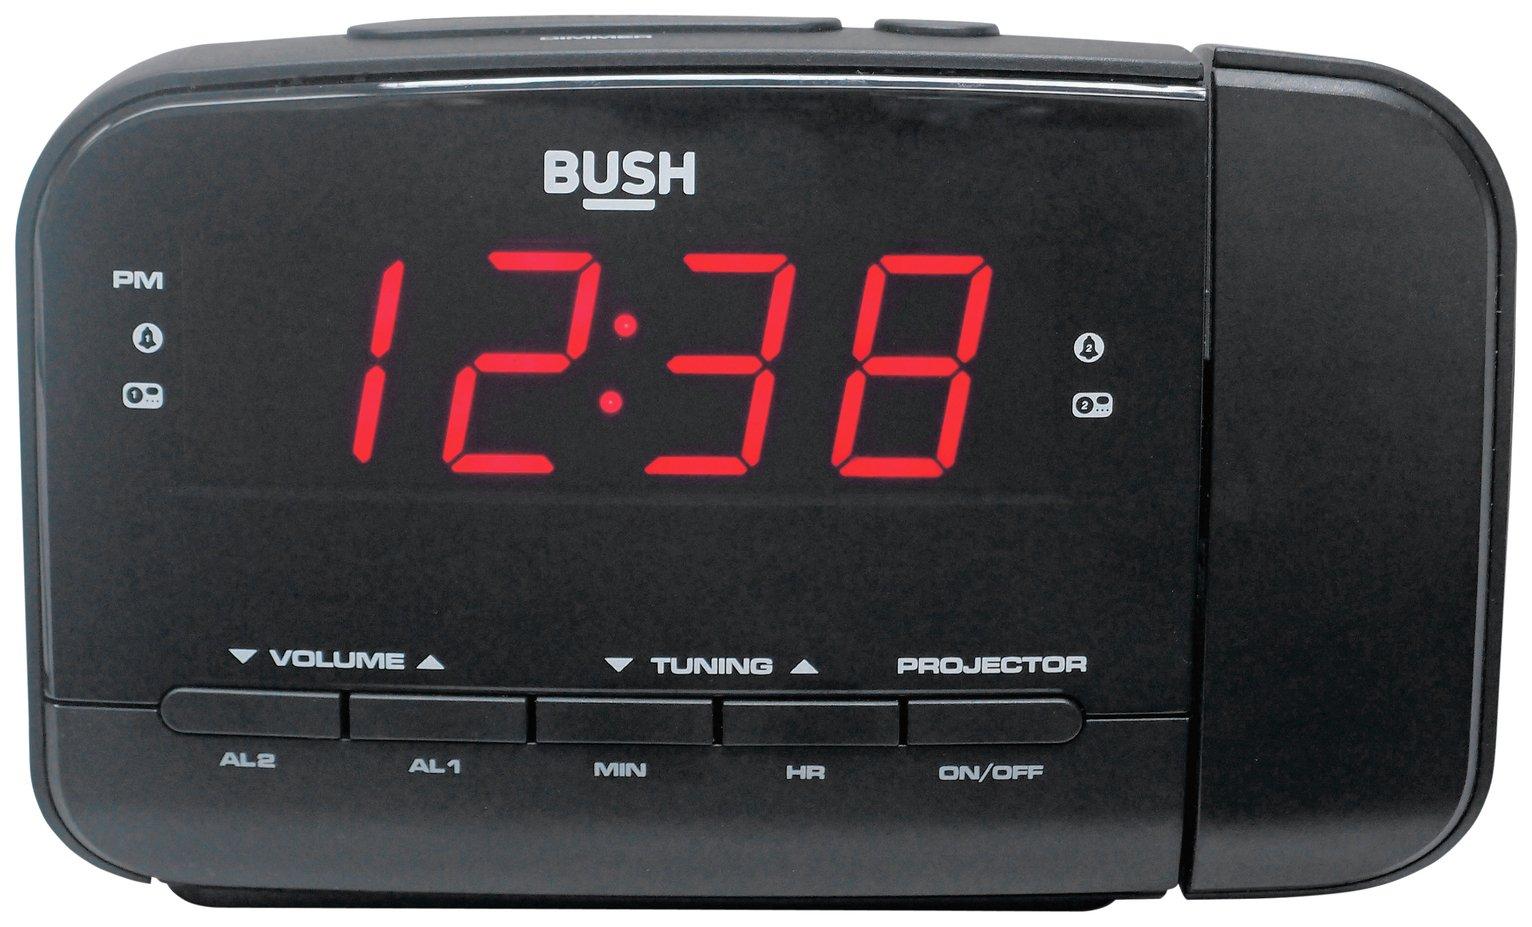 Bush - Projection Alarm Clock